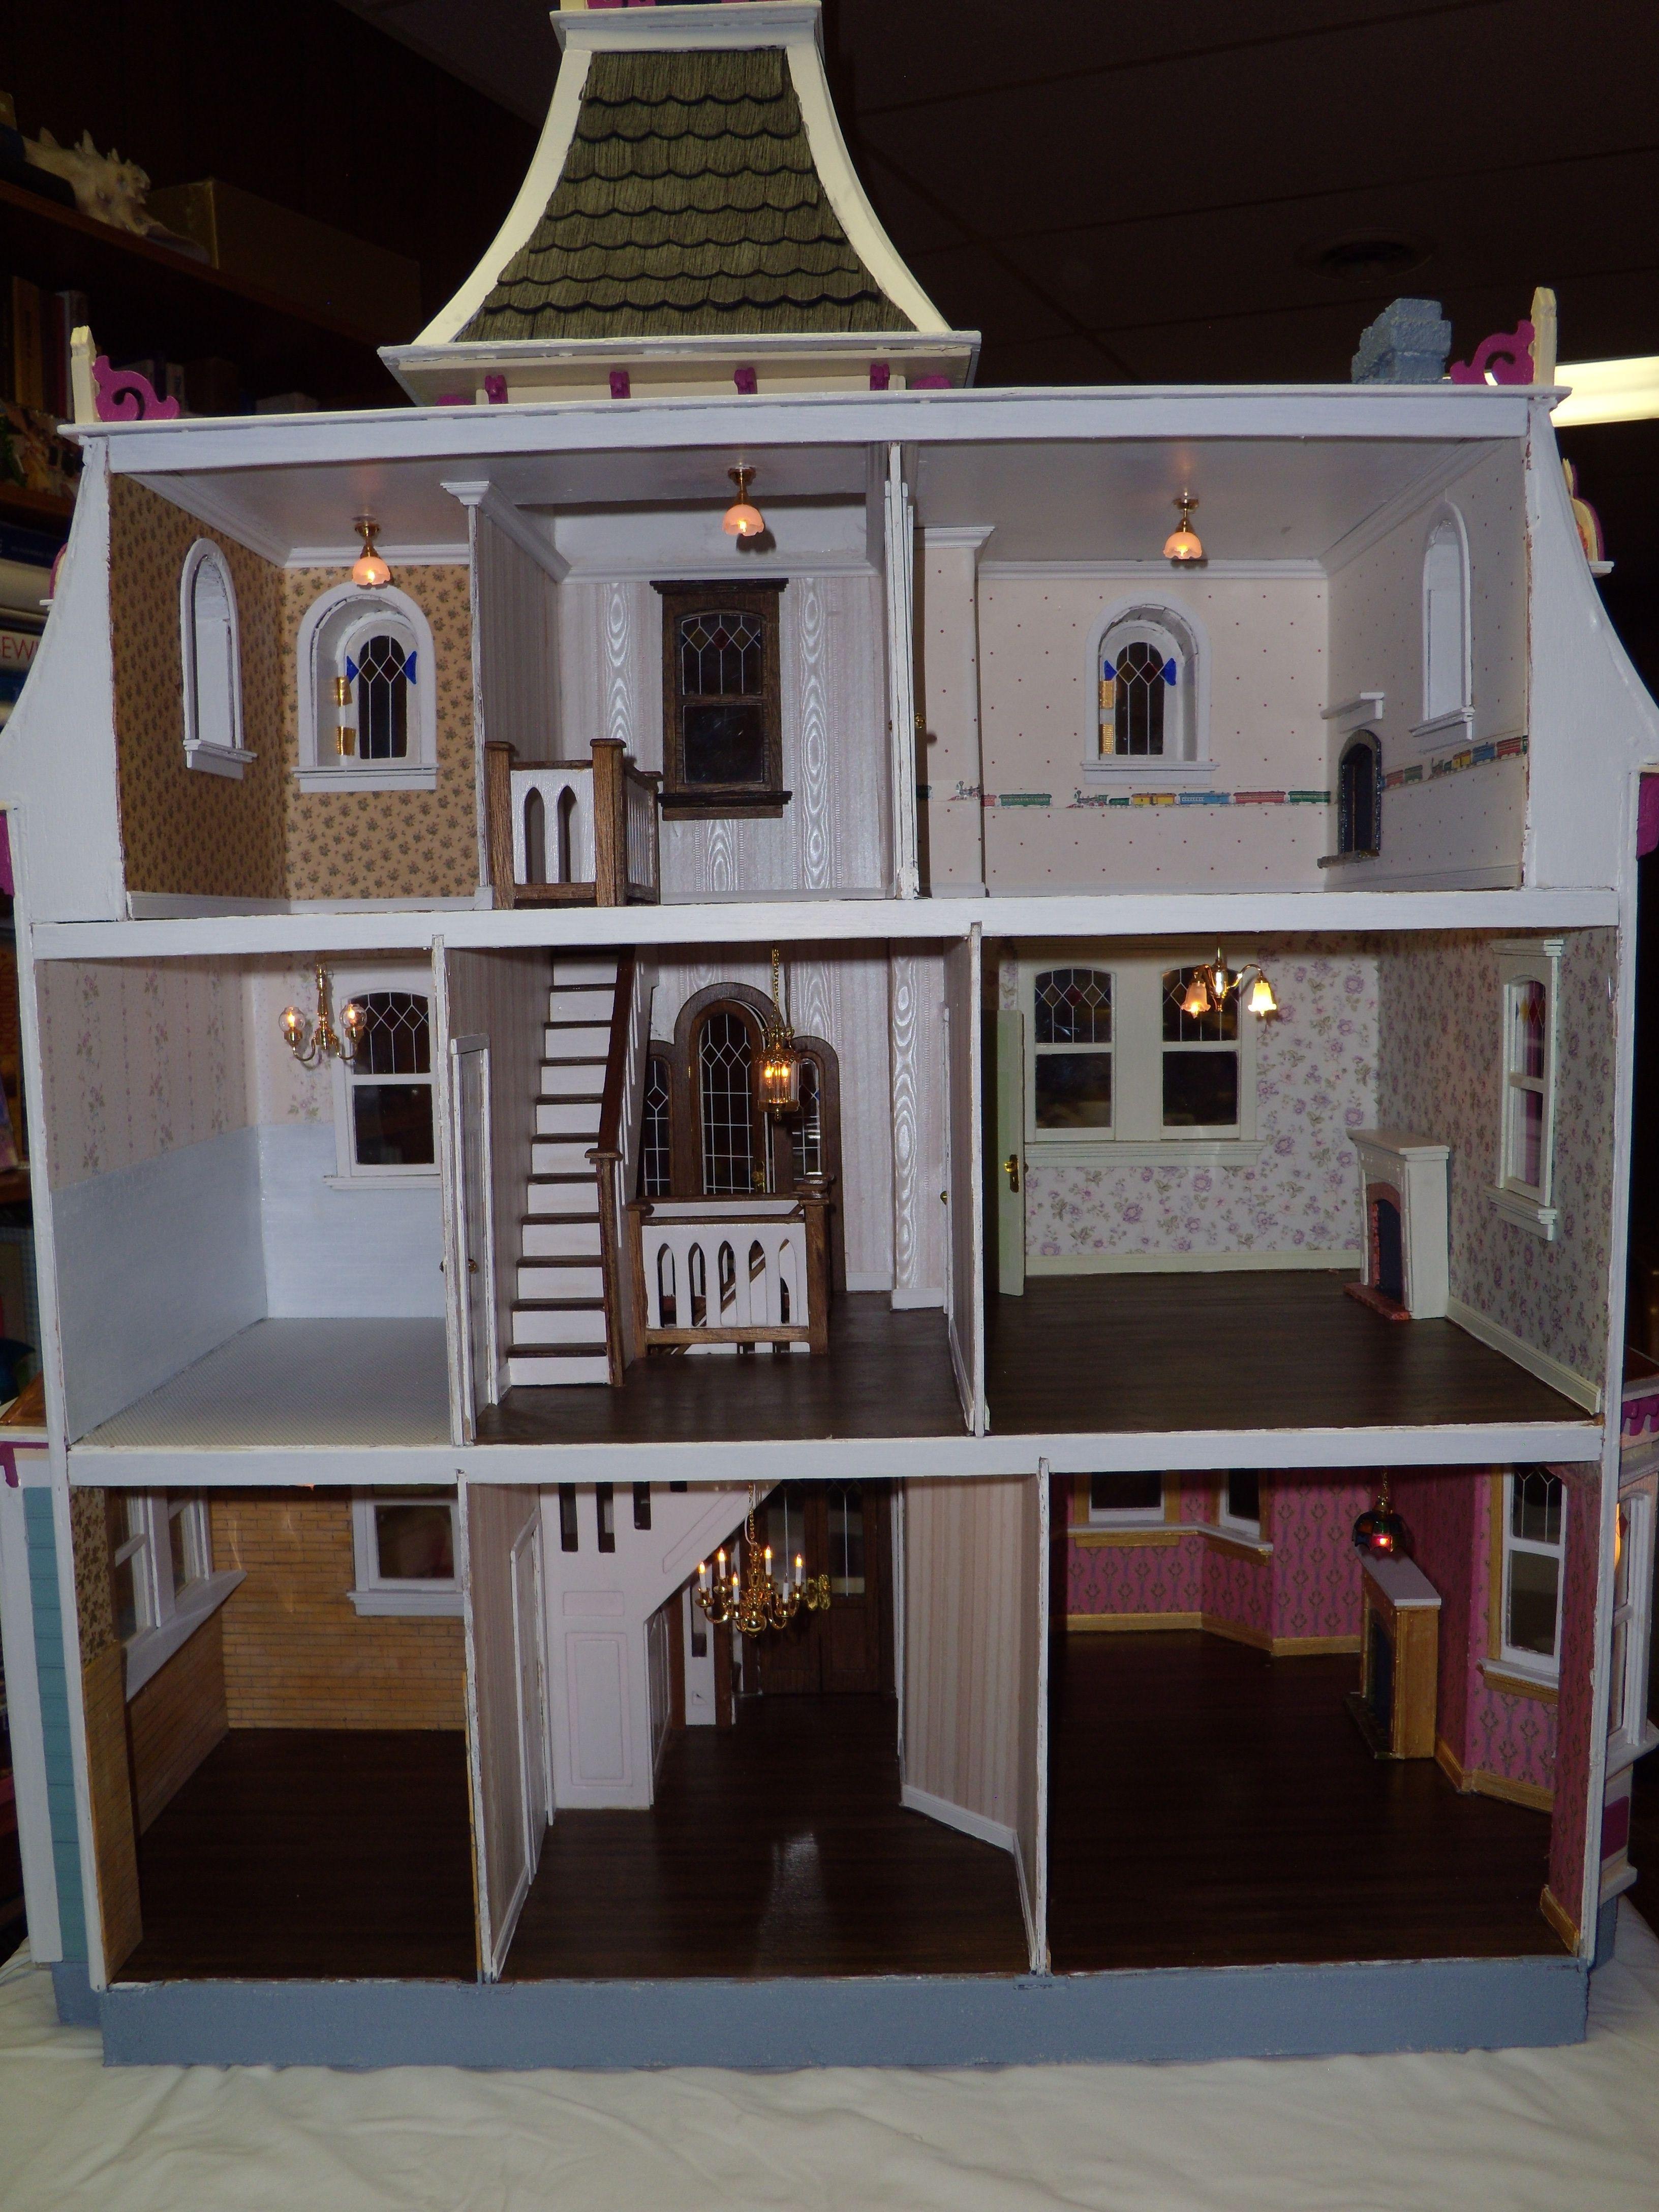 The Beacon Hill Interior My Dollhouse The Beacon